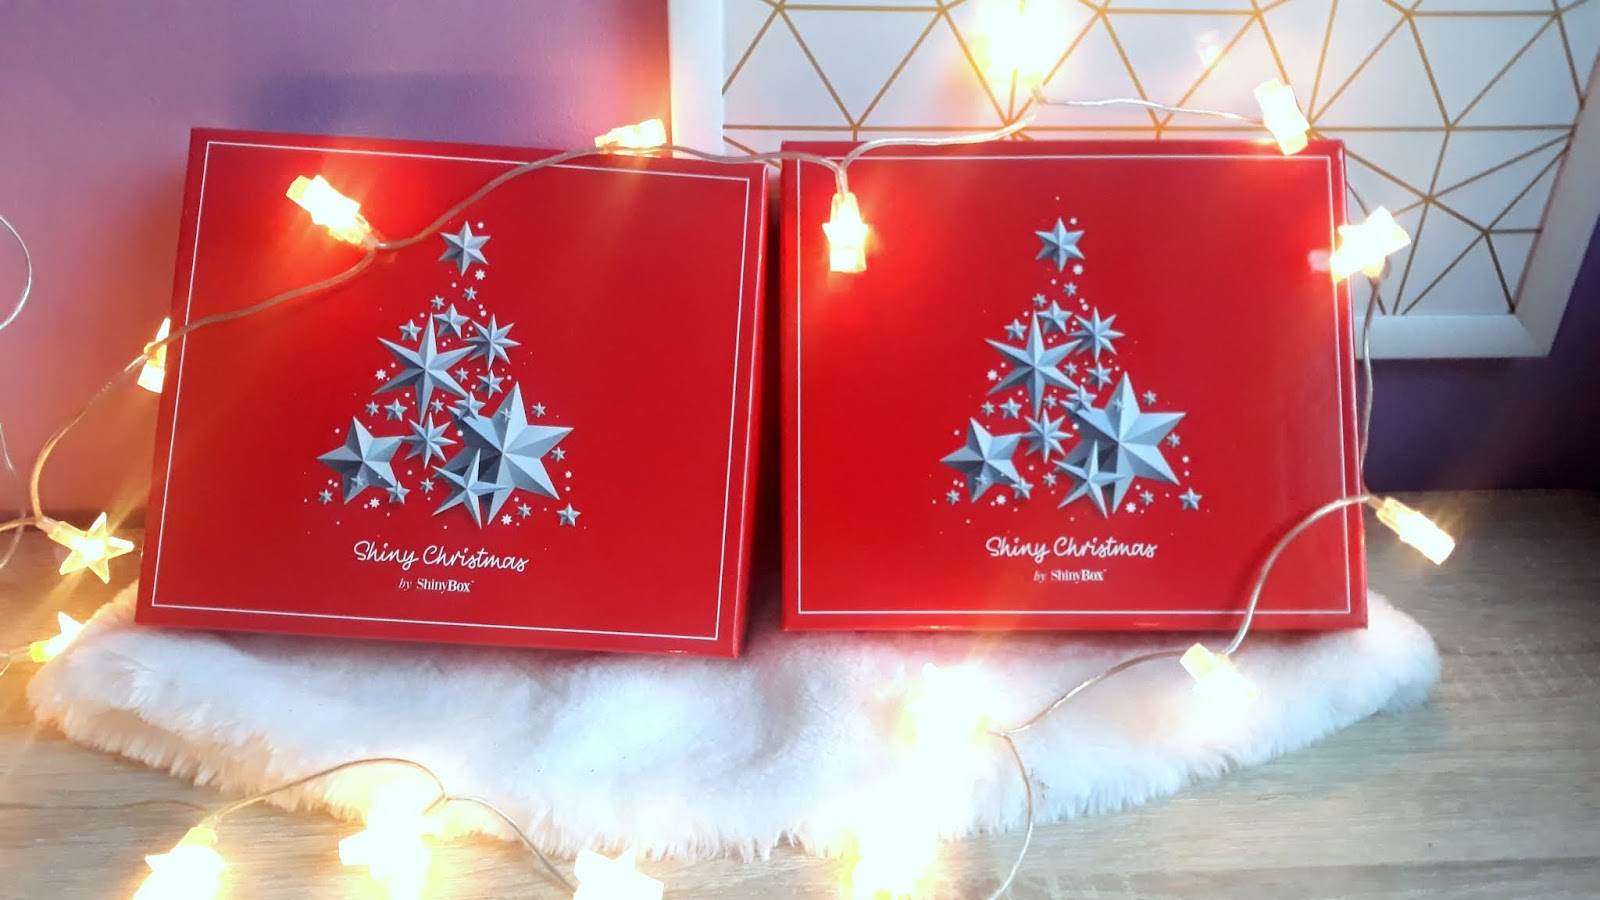 ShinyBox Shiny Christmas 2018